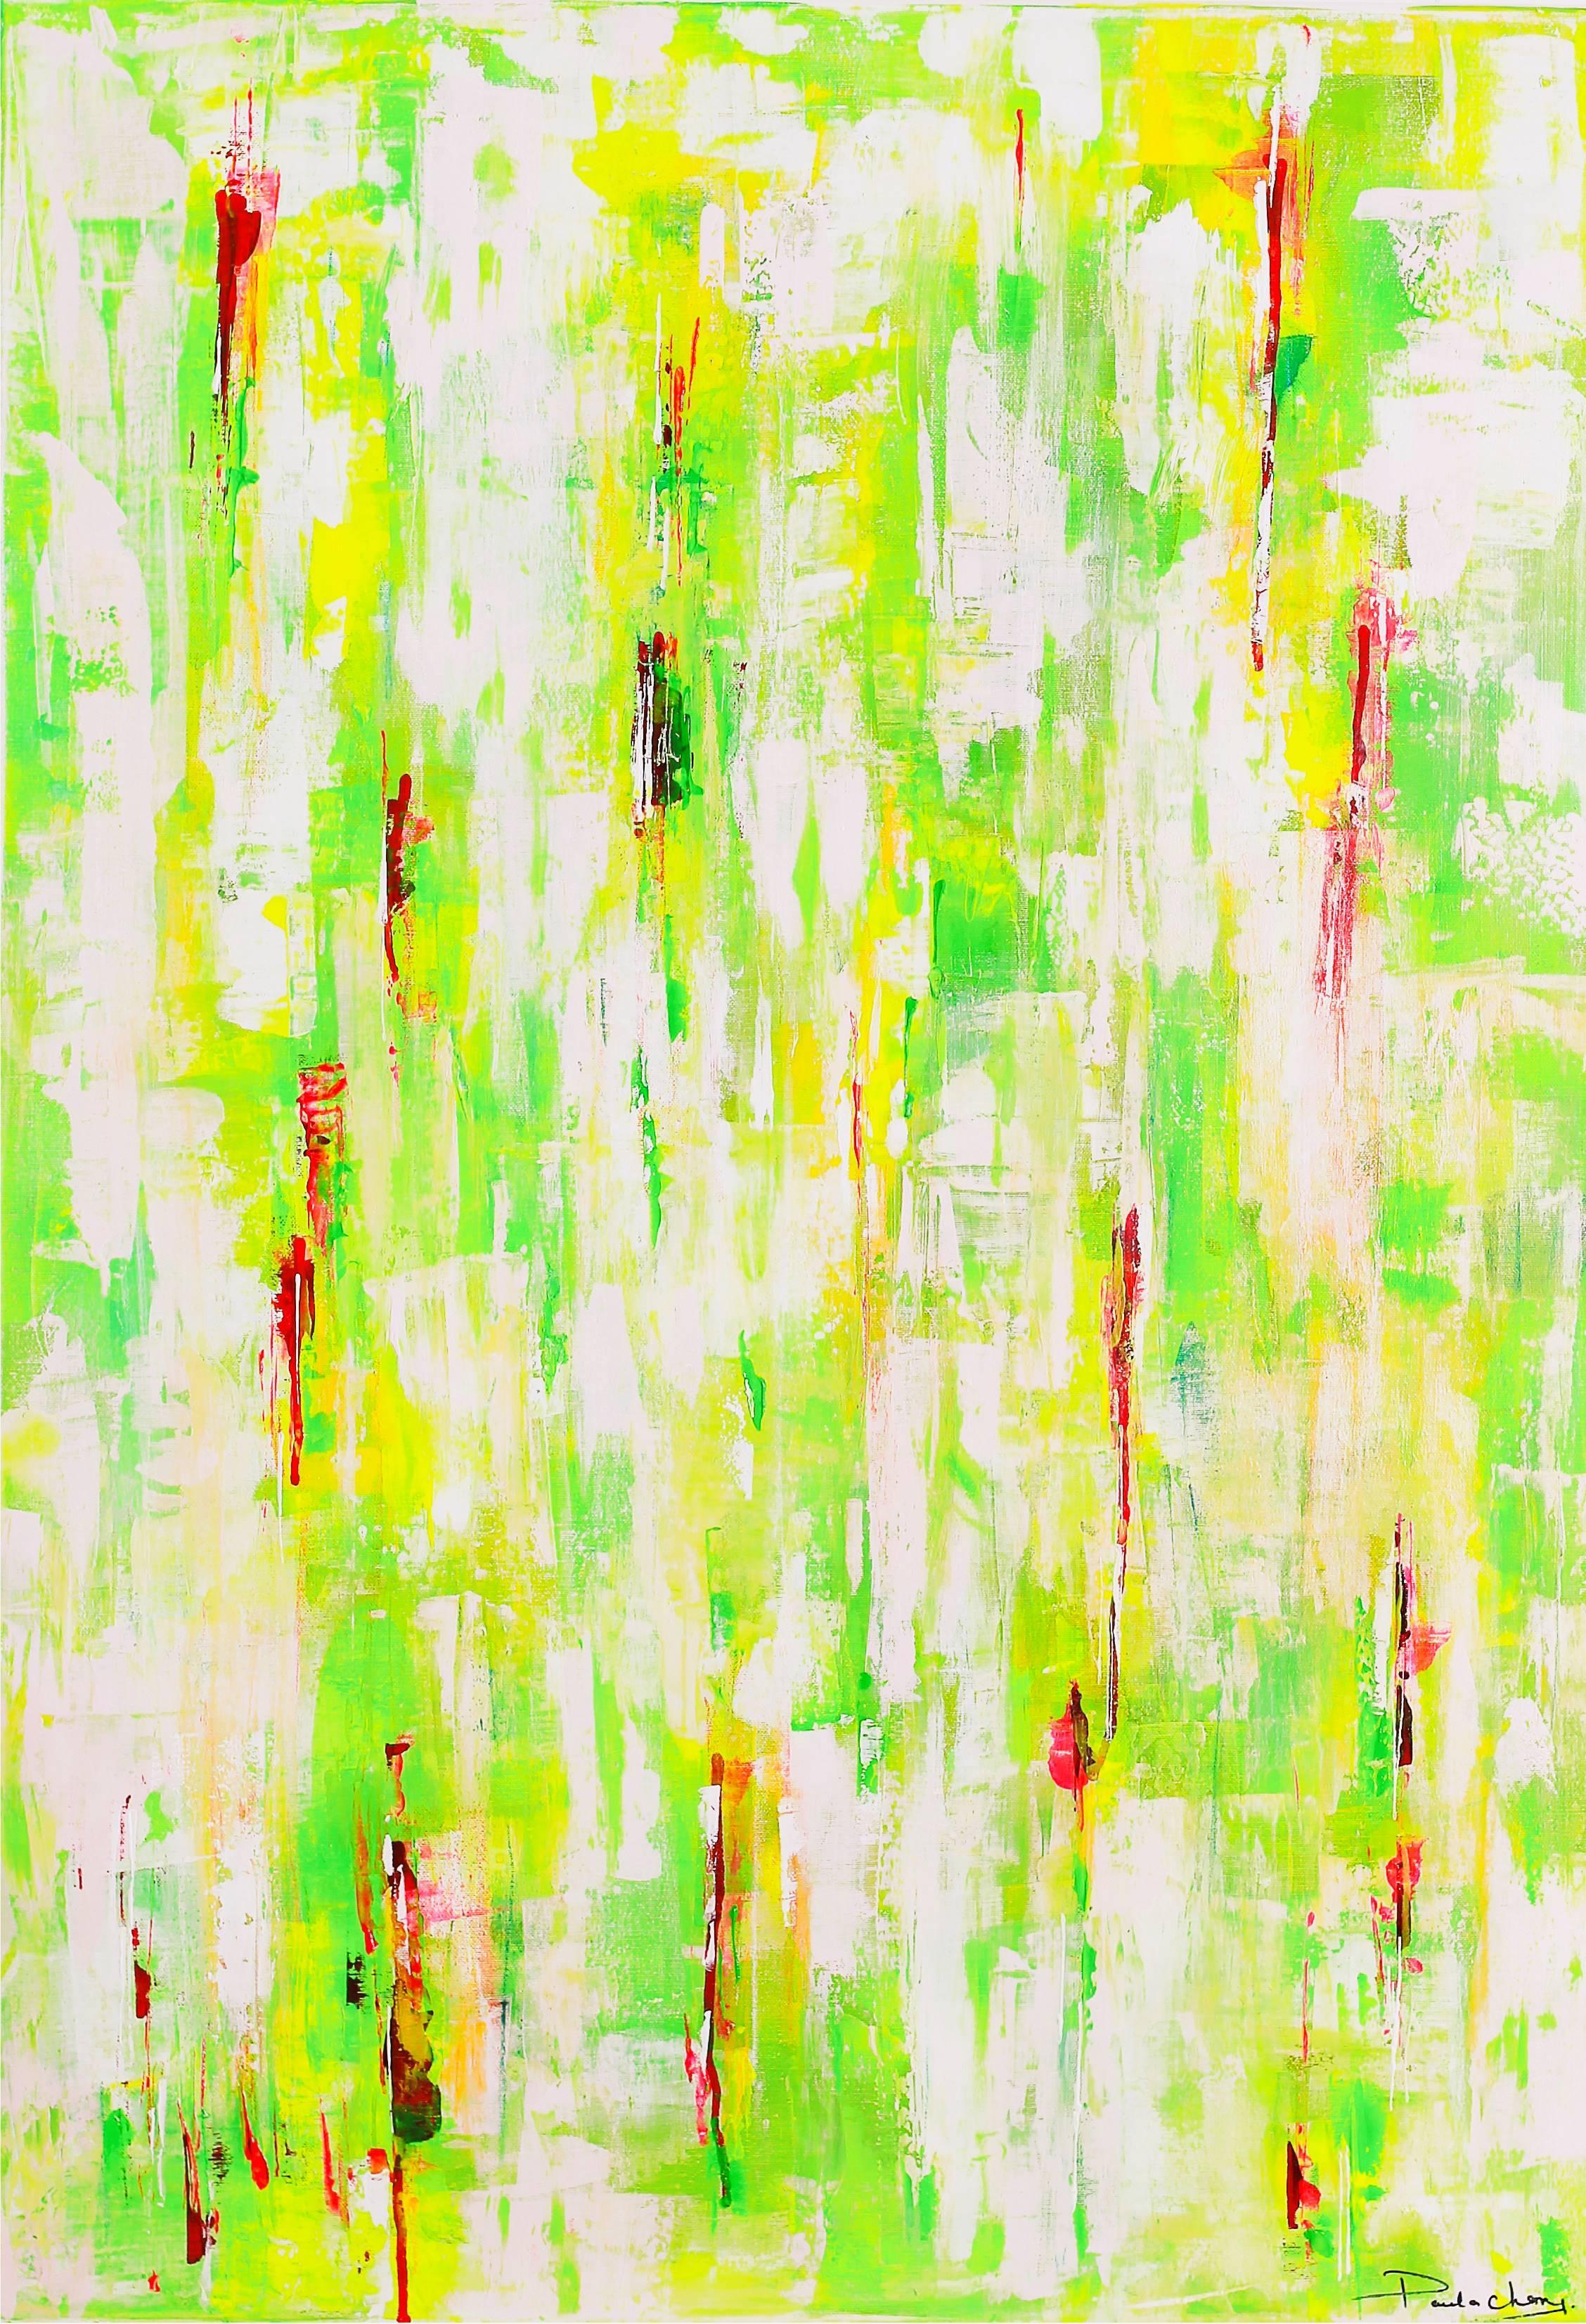 Paula Cherry, Lush Green, Original Painting, Abstract Art, Affordable Art